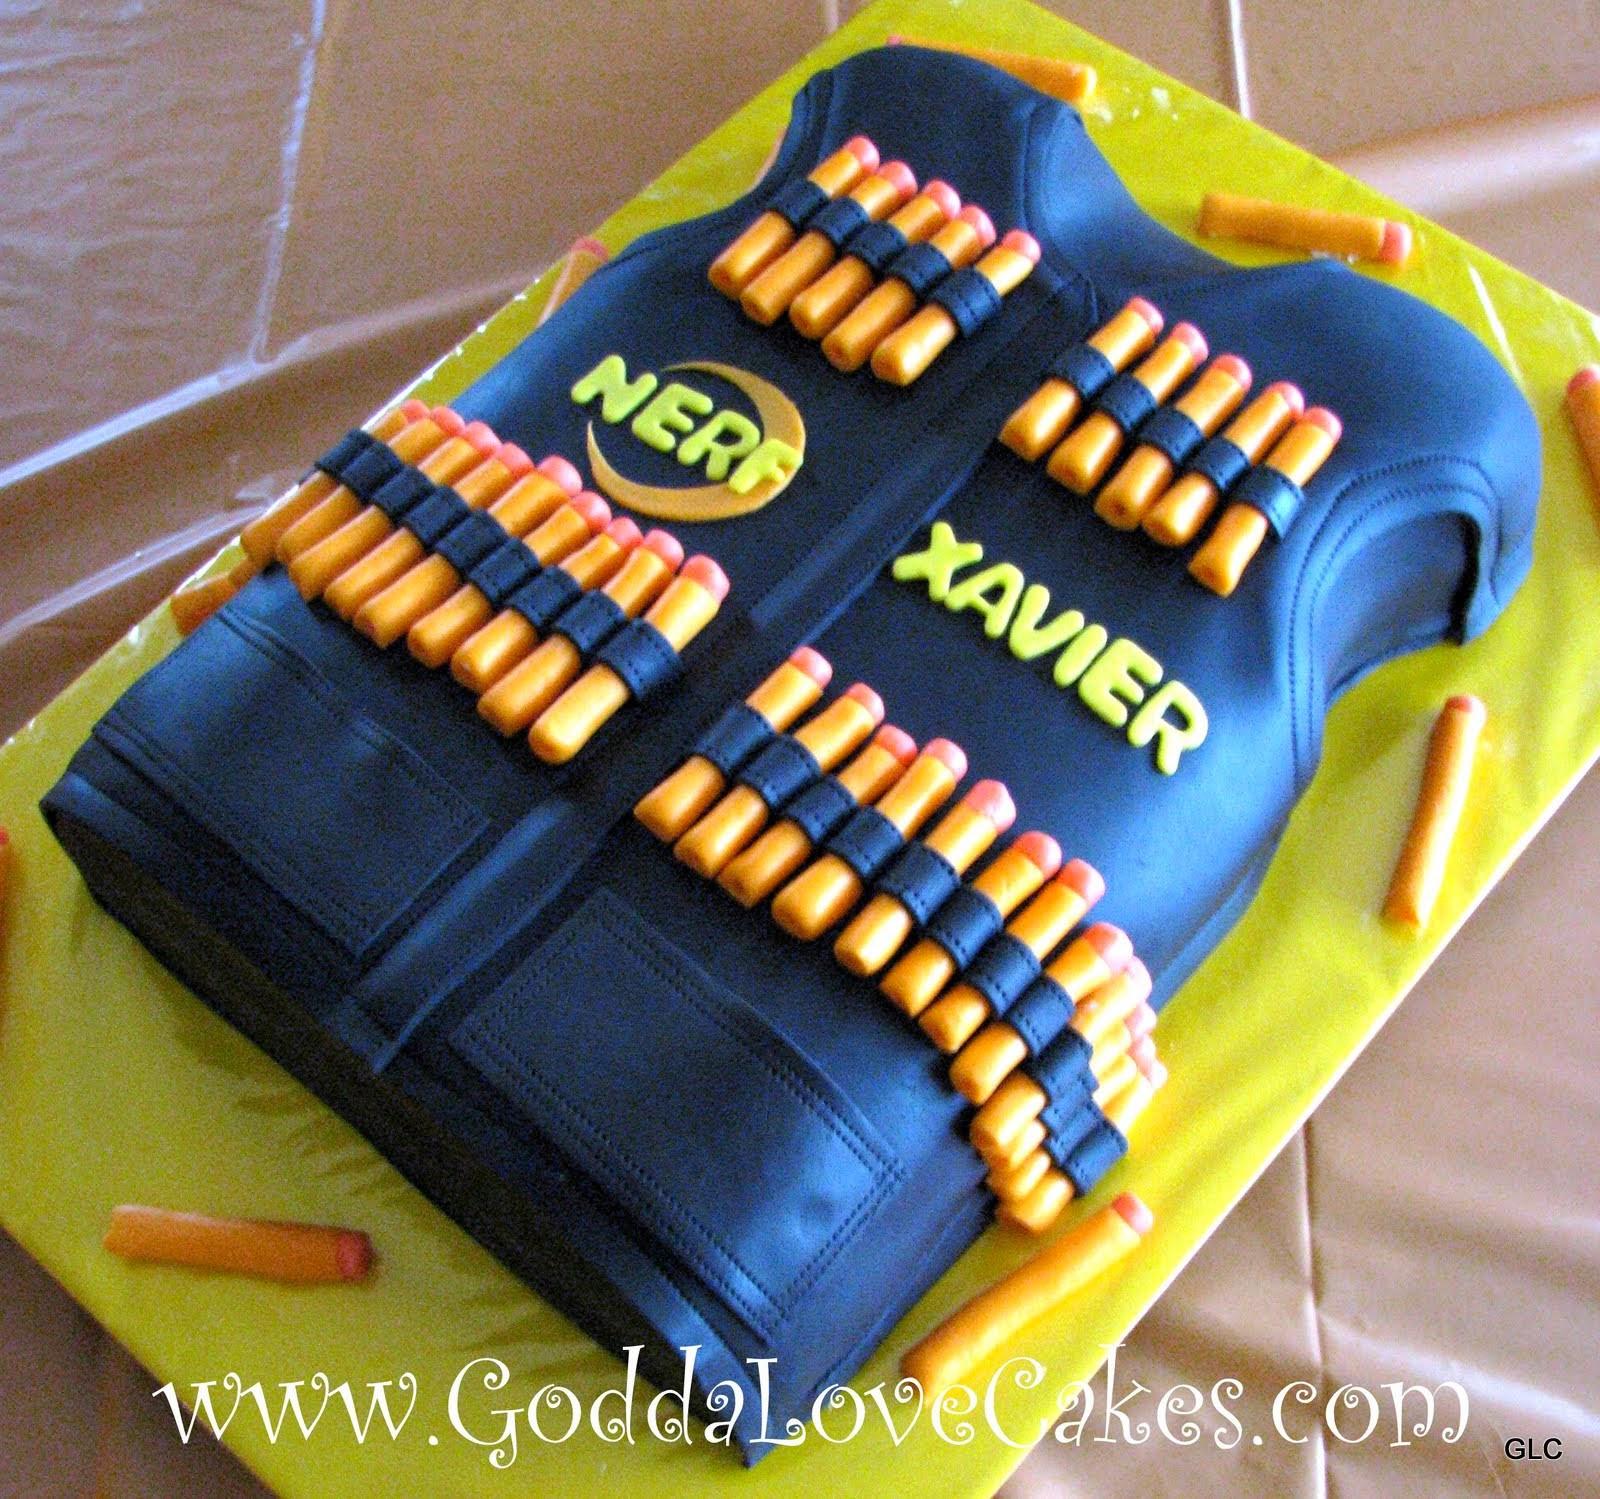 Best ideas about Nerf Gun Birthday Cake . Save or Pin nerf birthday cake photos neuloajunklens overblog Now.